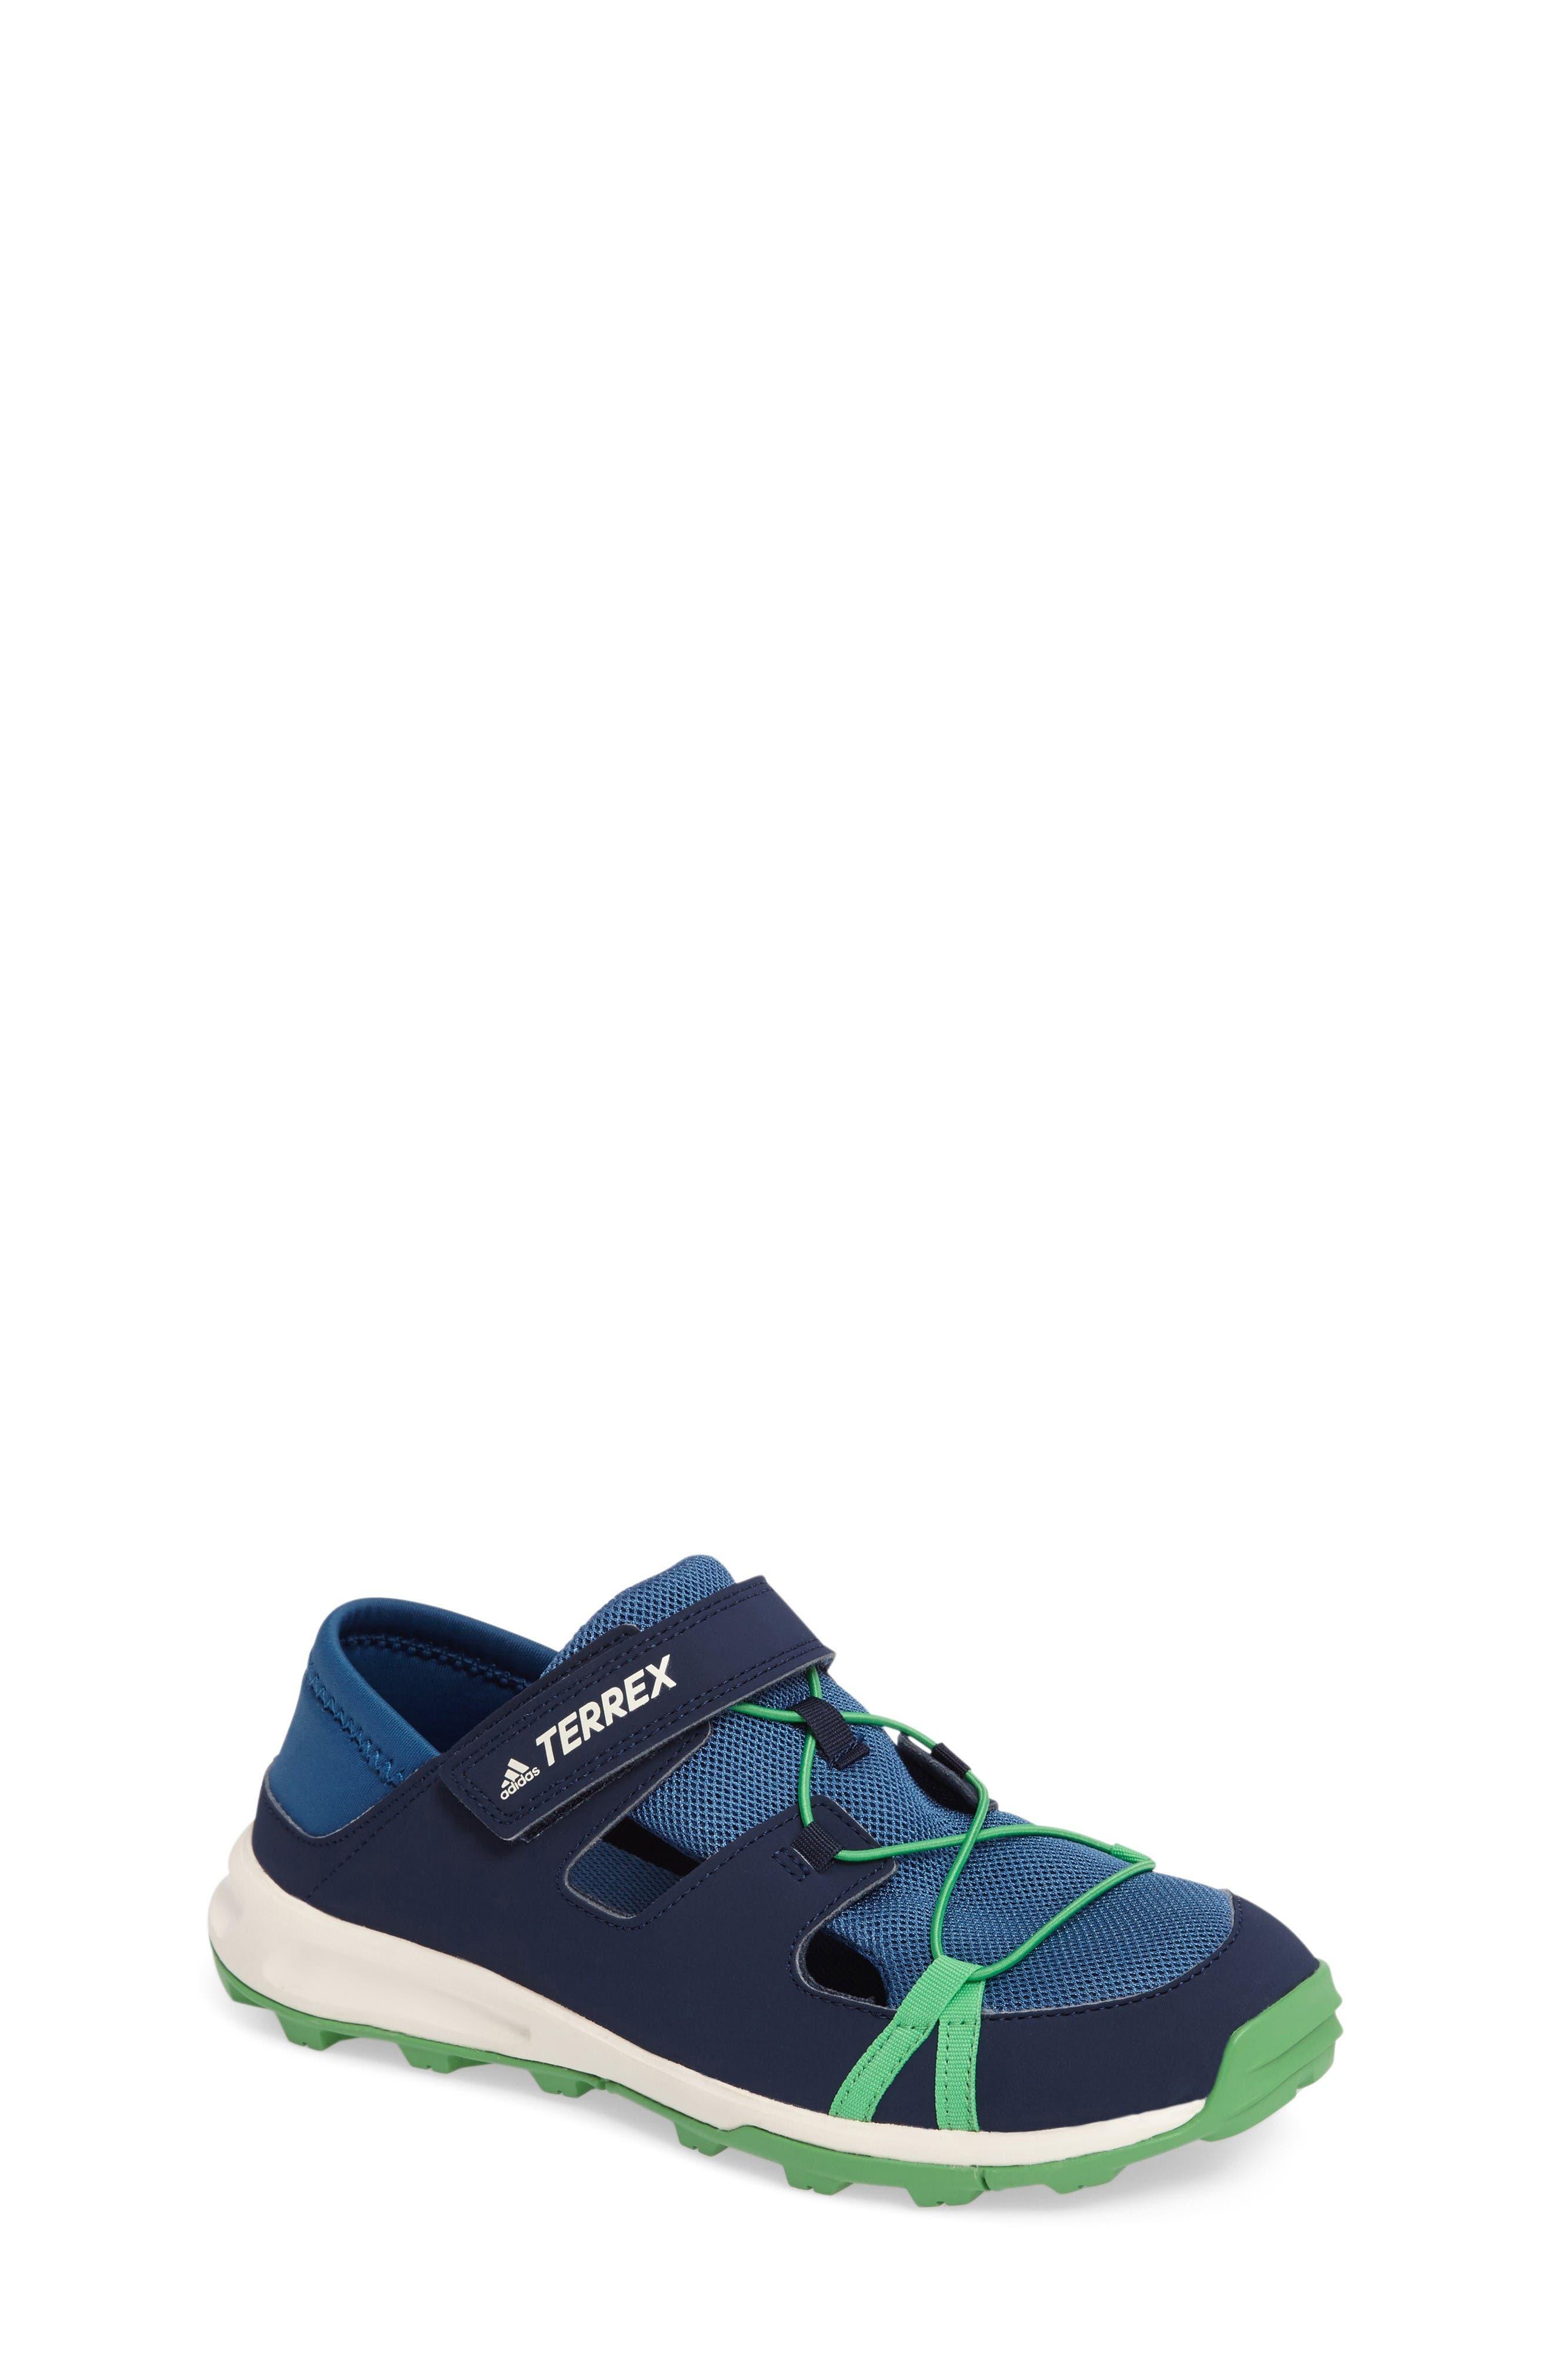 adidas Terrex Tivid Sneaker (Toddler, Little Kid & Big Kid)